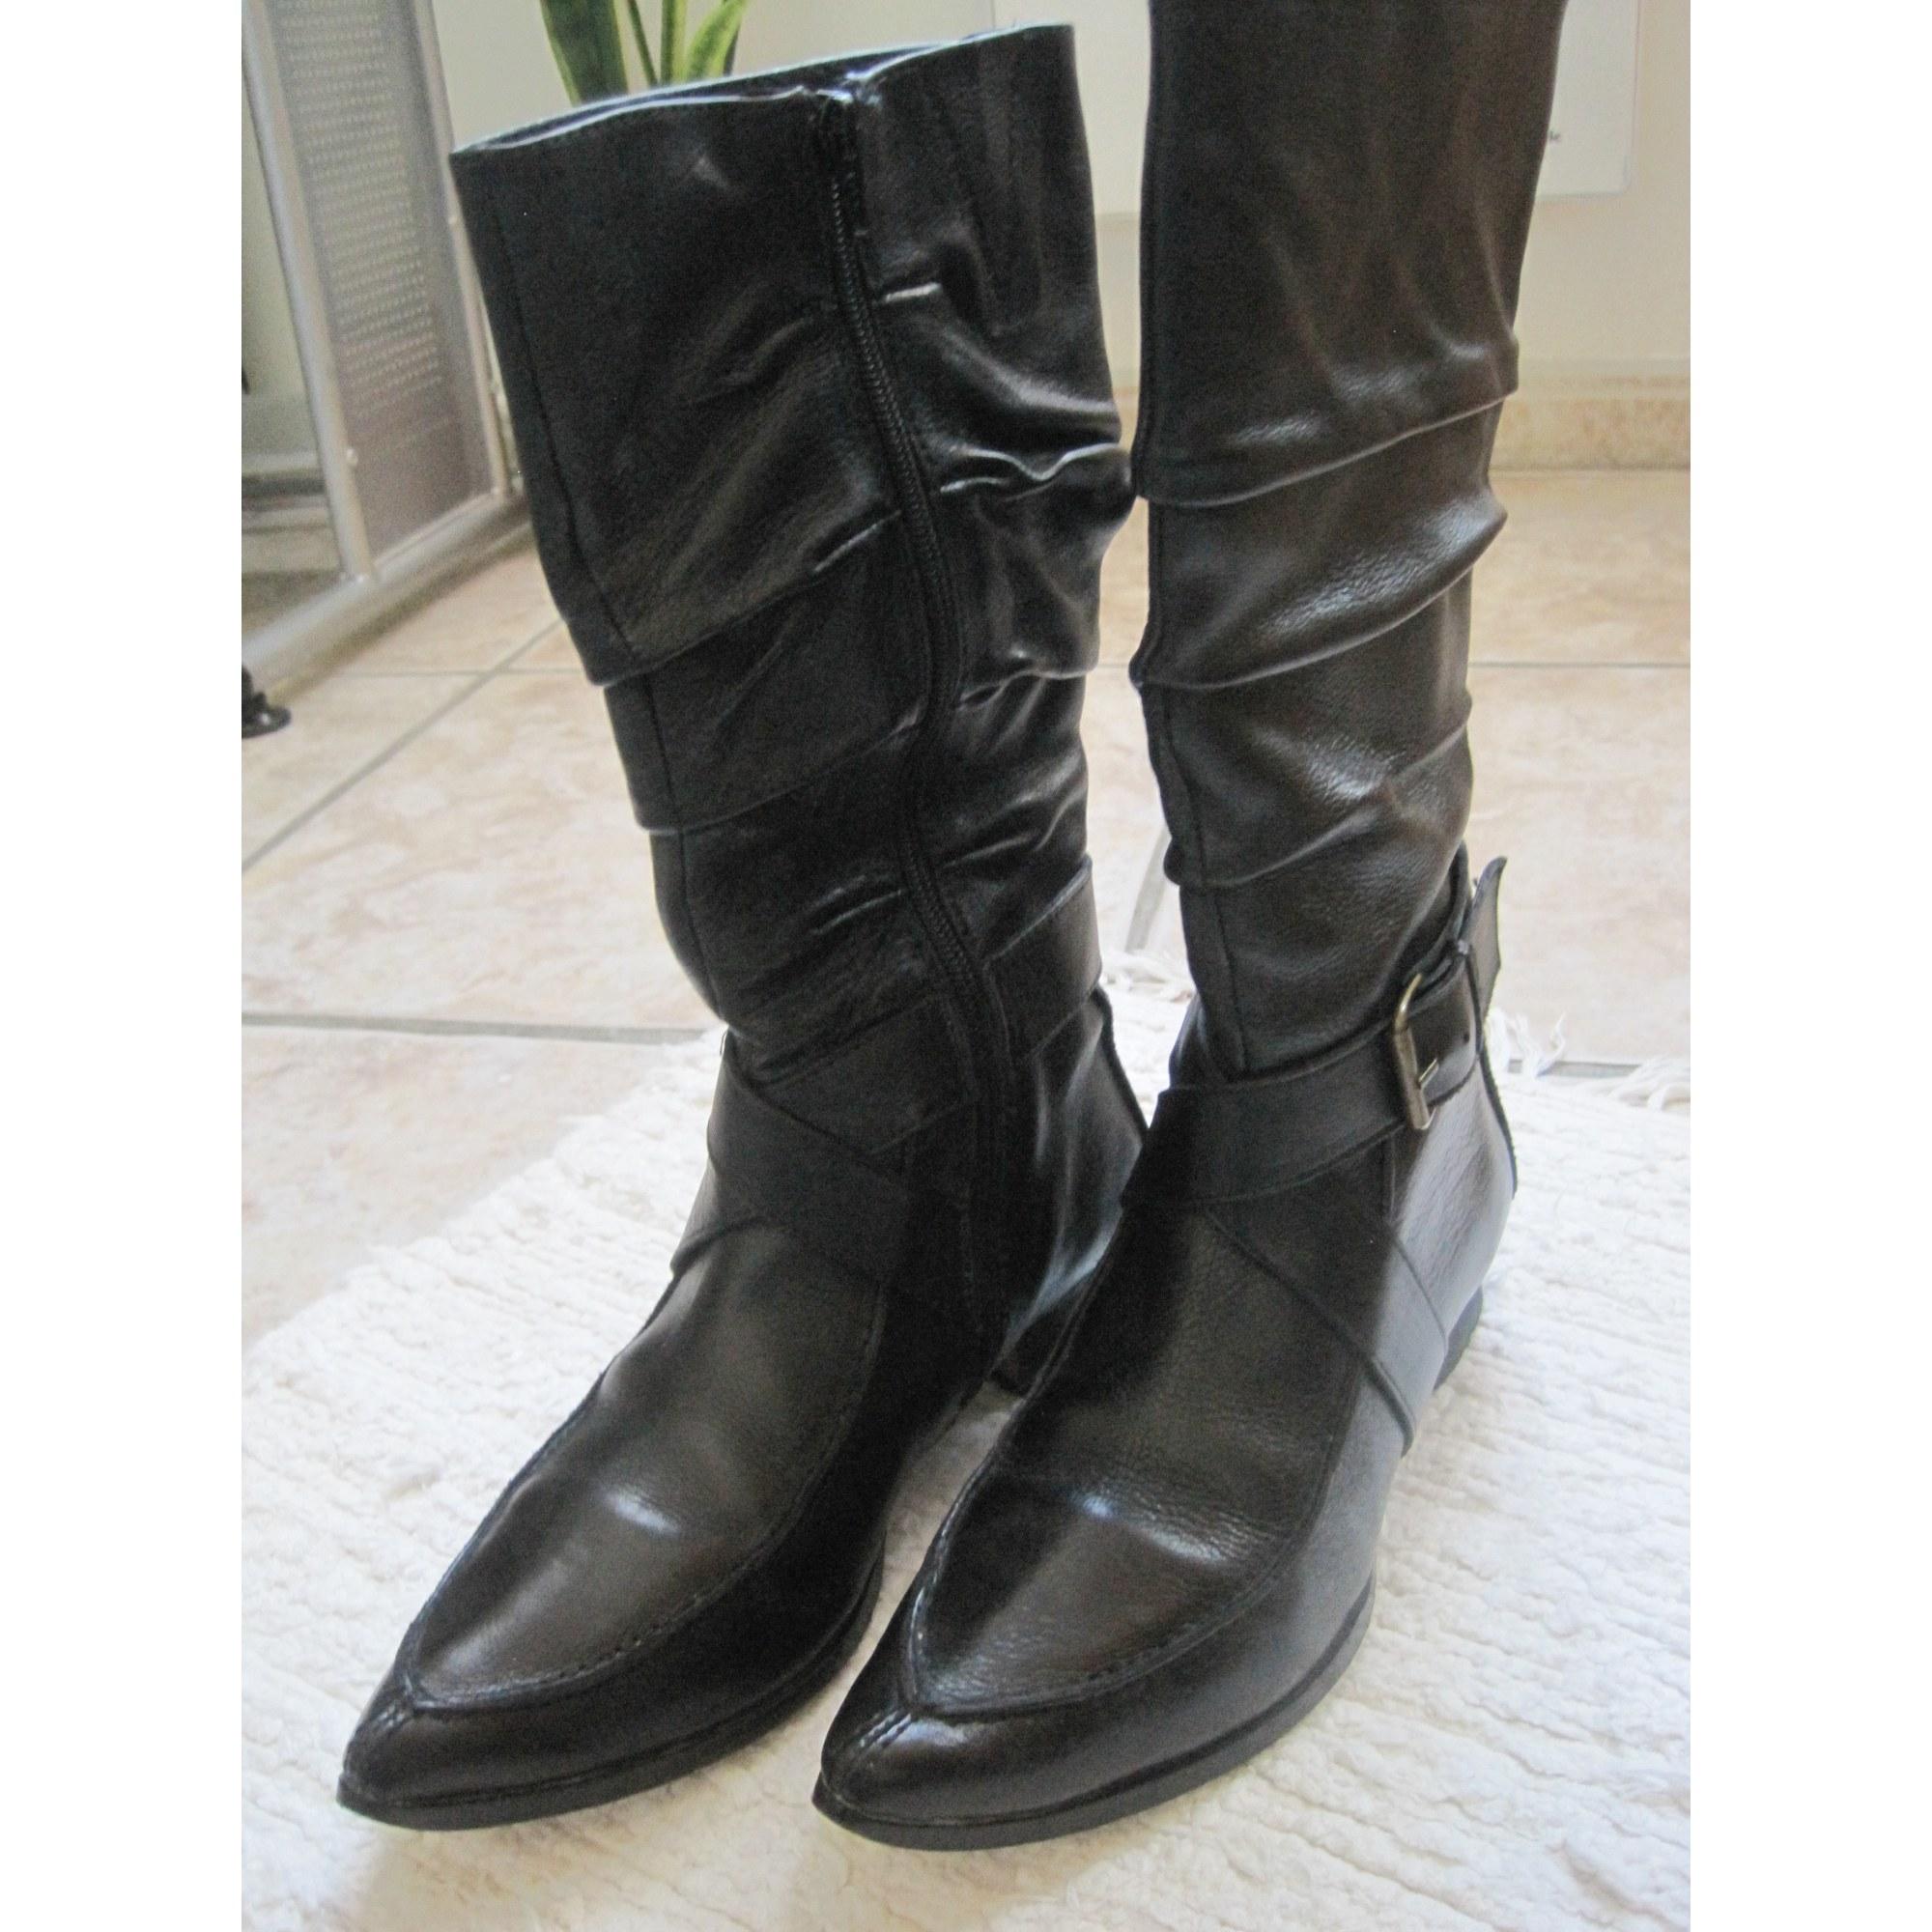 taille 40 3c113 2f270 Santiags, bottines, low boots cowboy ILARIO FERUCCI